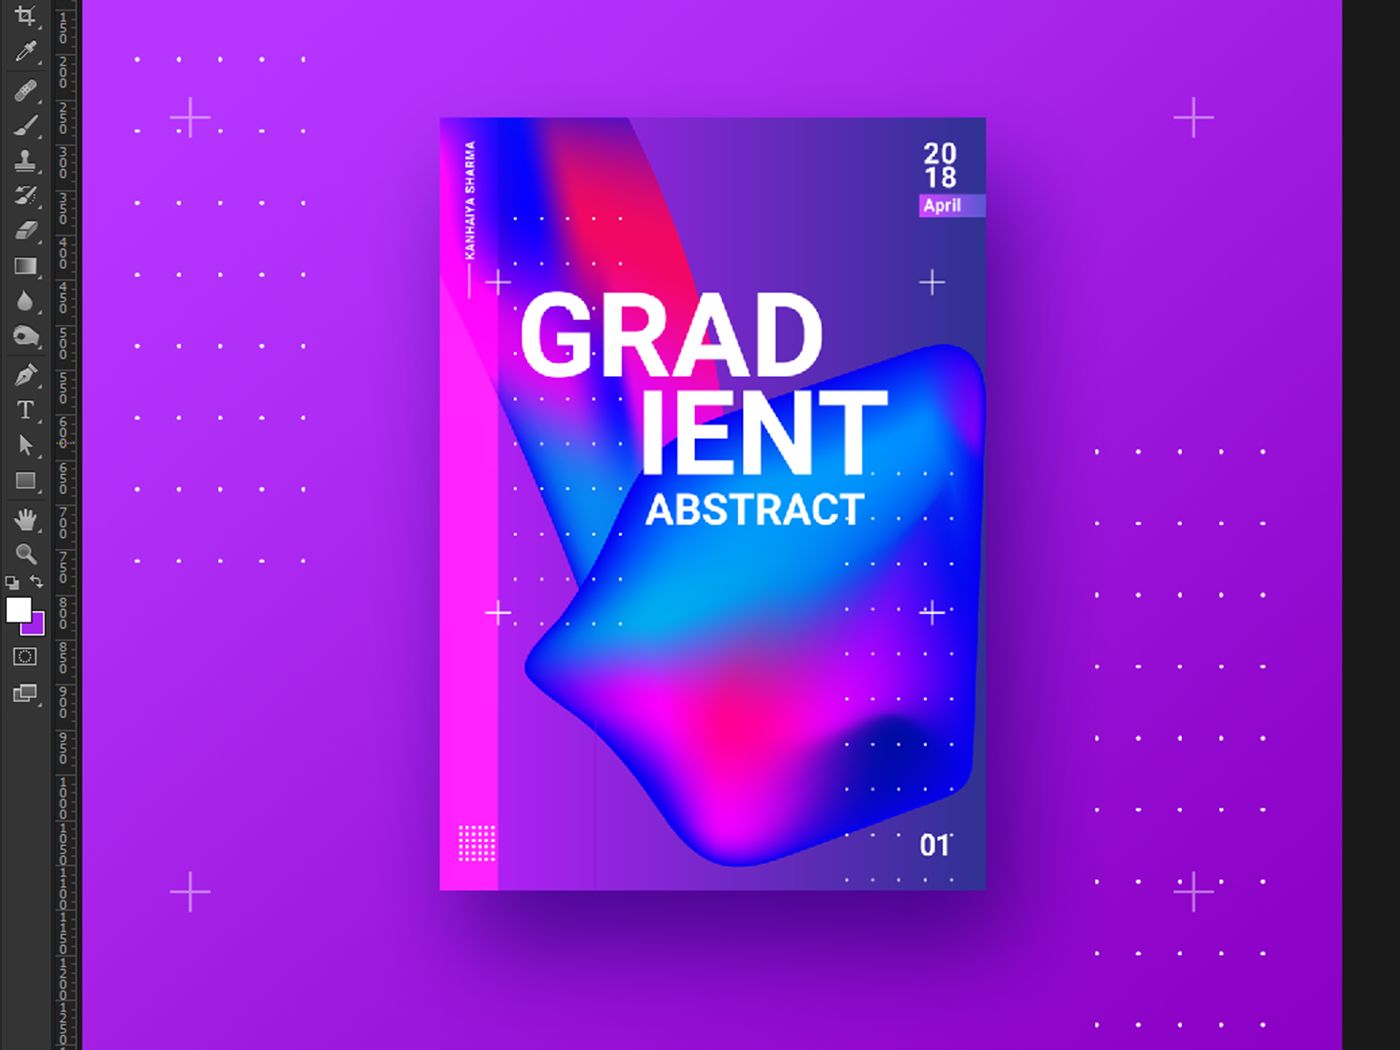 Abstract gradient poster design web post poster illustration 3d art 3d colorfull style baugasm landing page colorscheme colors gradient logo photoshop grid typography minimalist